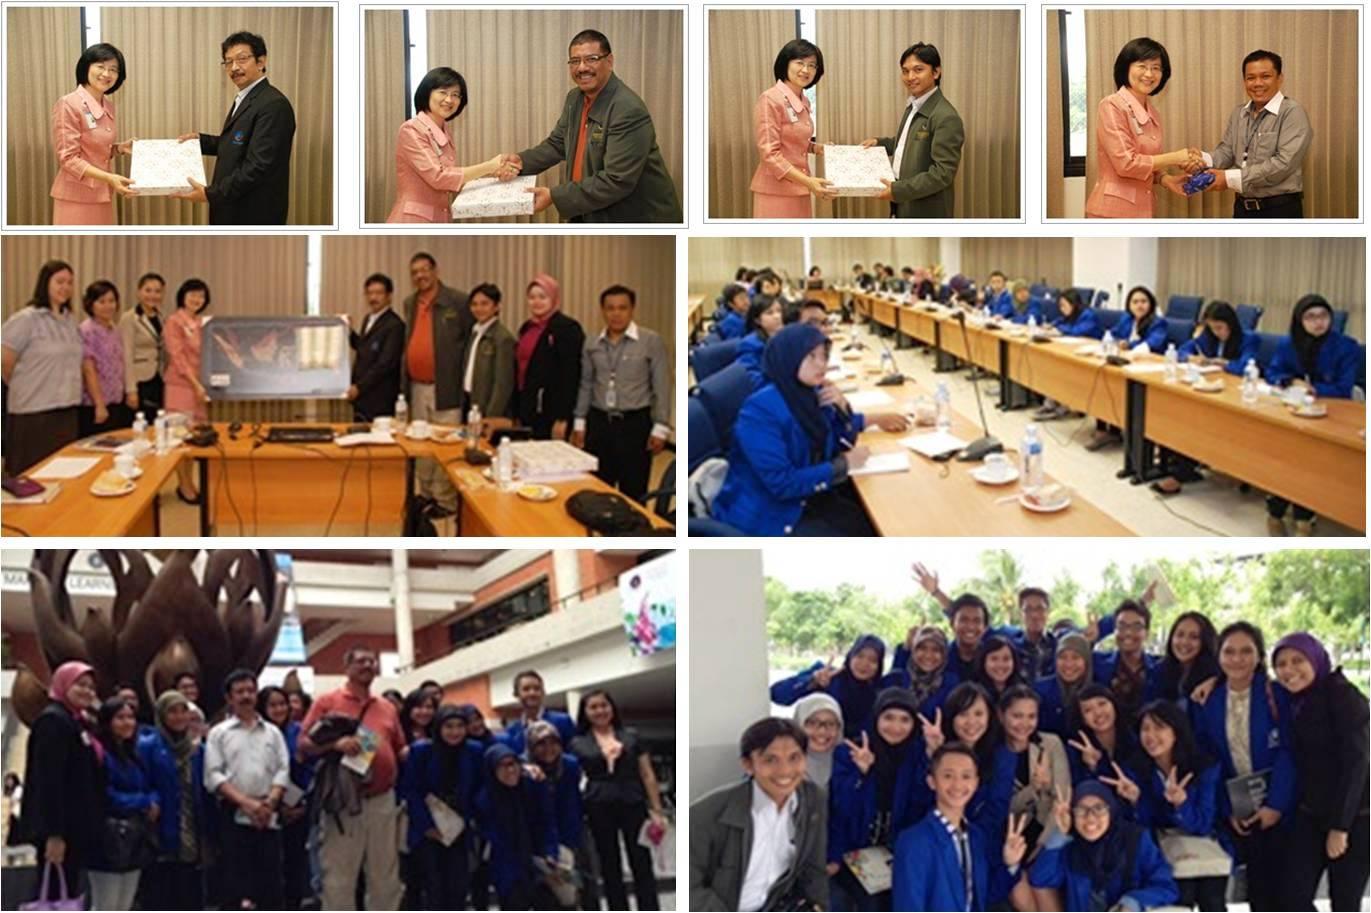 Kunjungan Kerjasama dan Studi Banding Fisioterapi Esa Unggul ke Mahidol University, Thailand